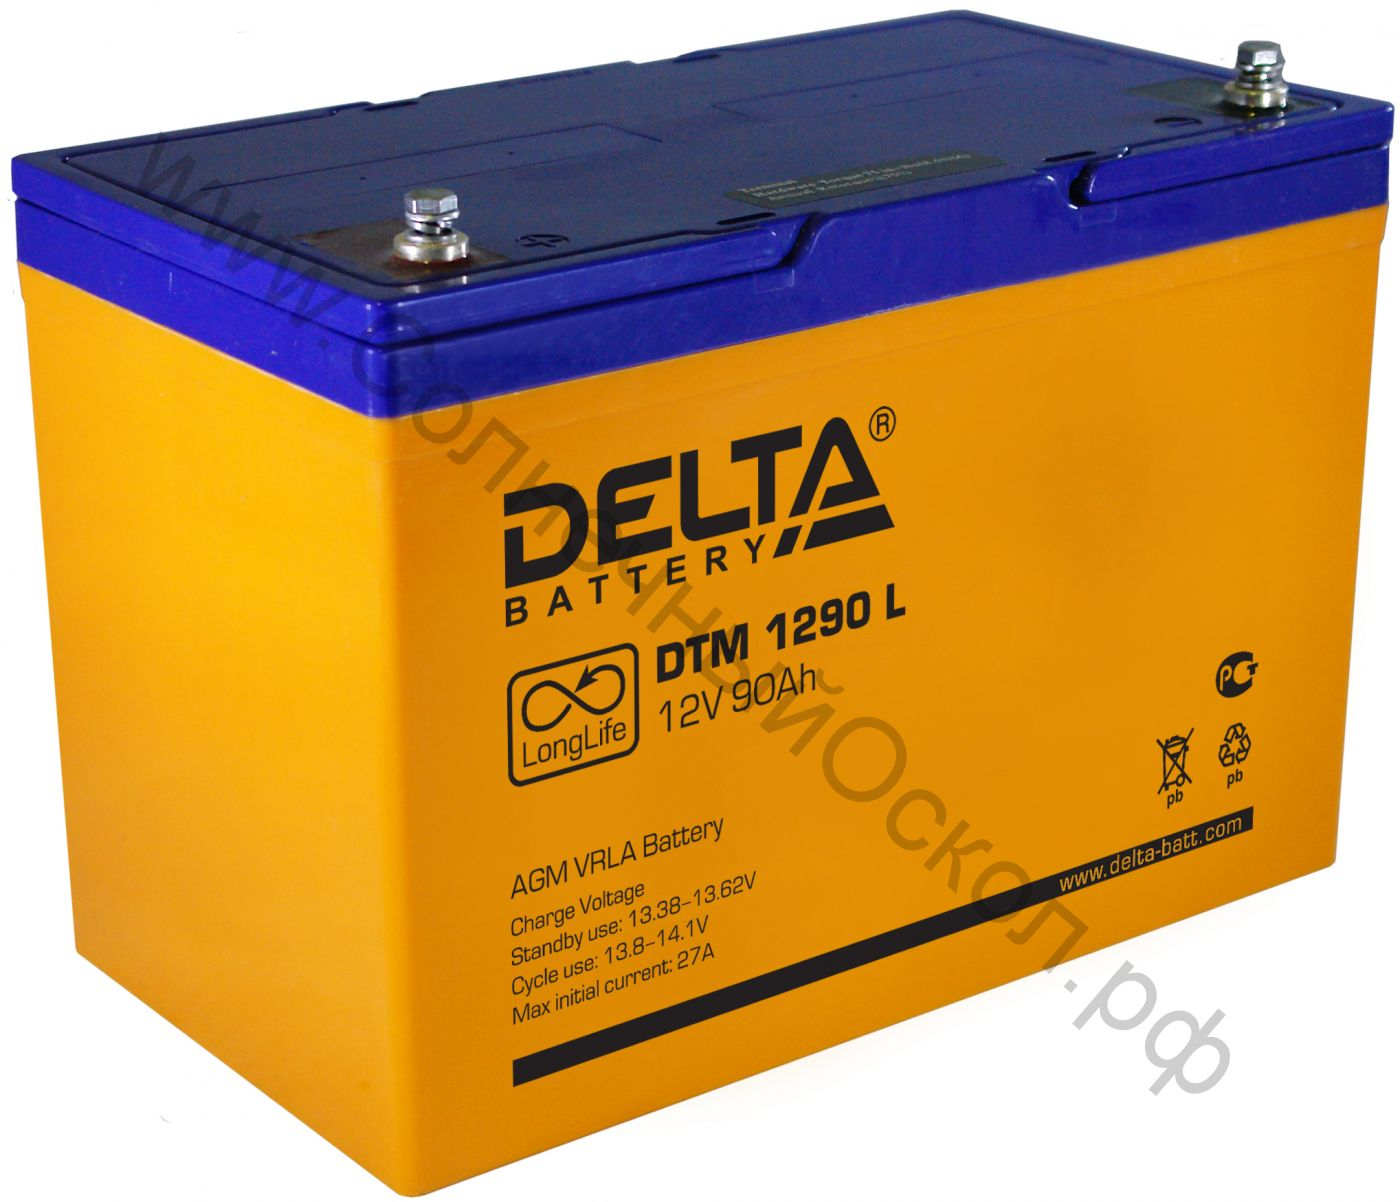 DTM 1290 L